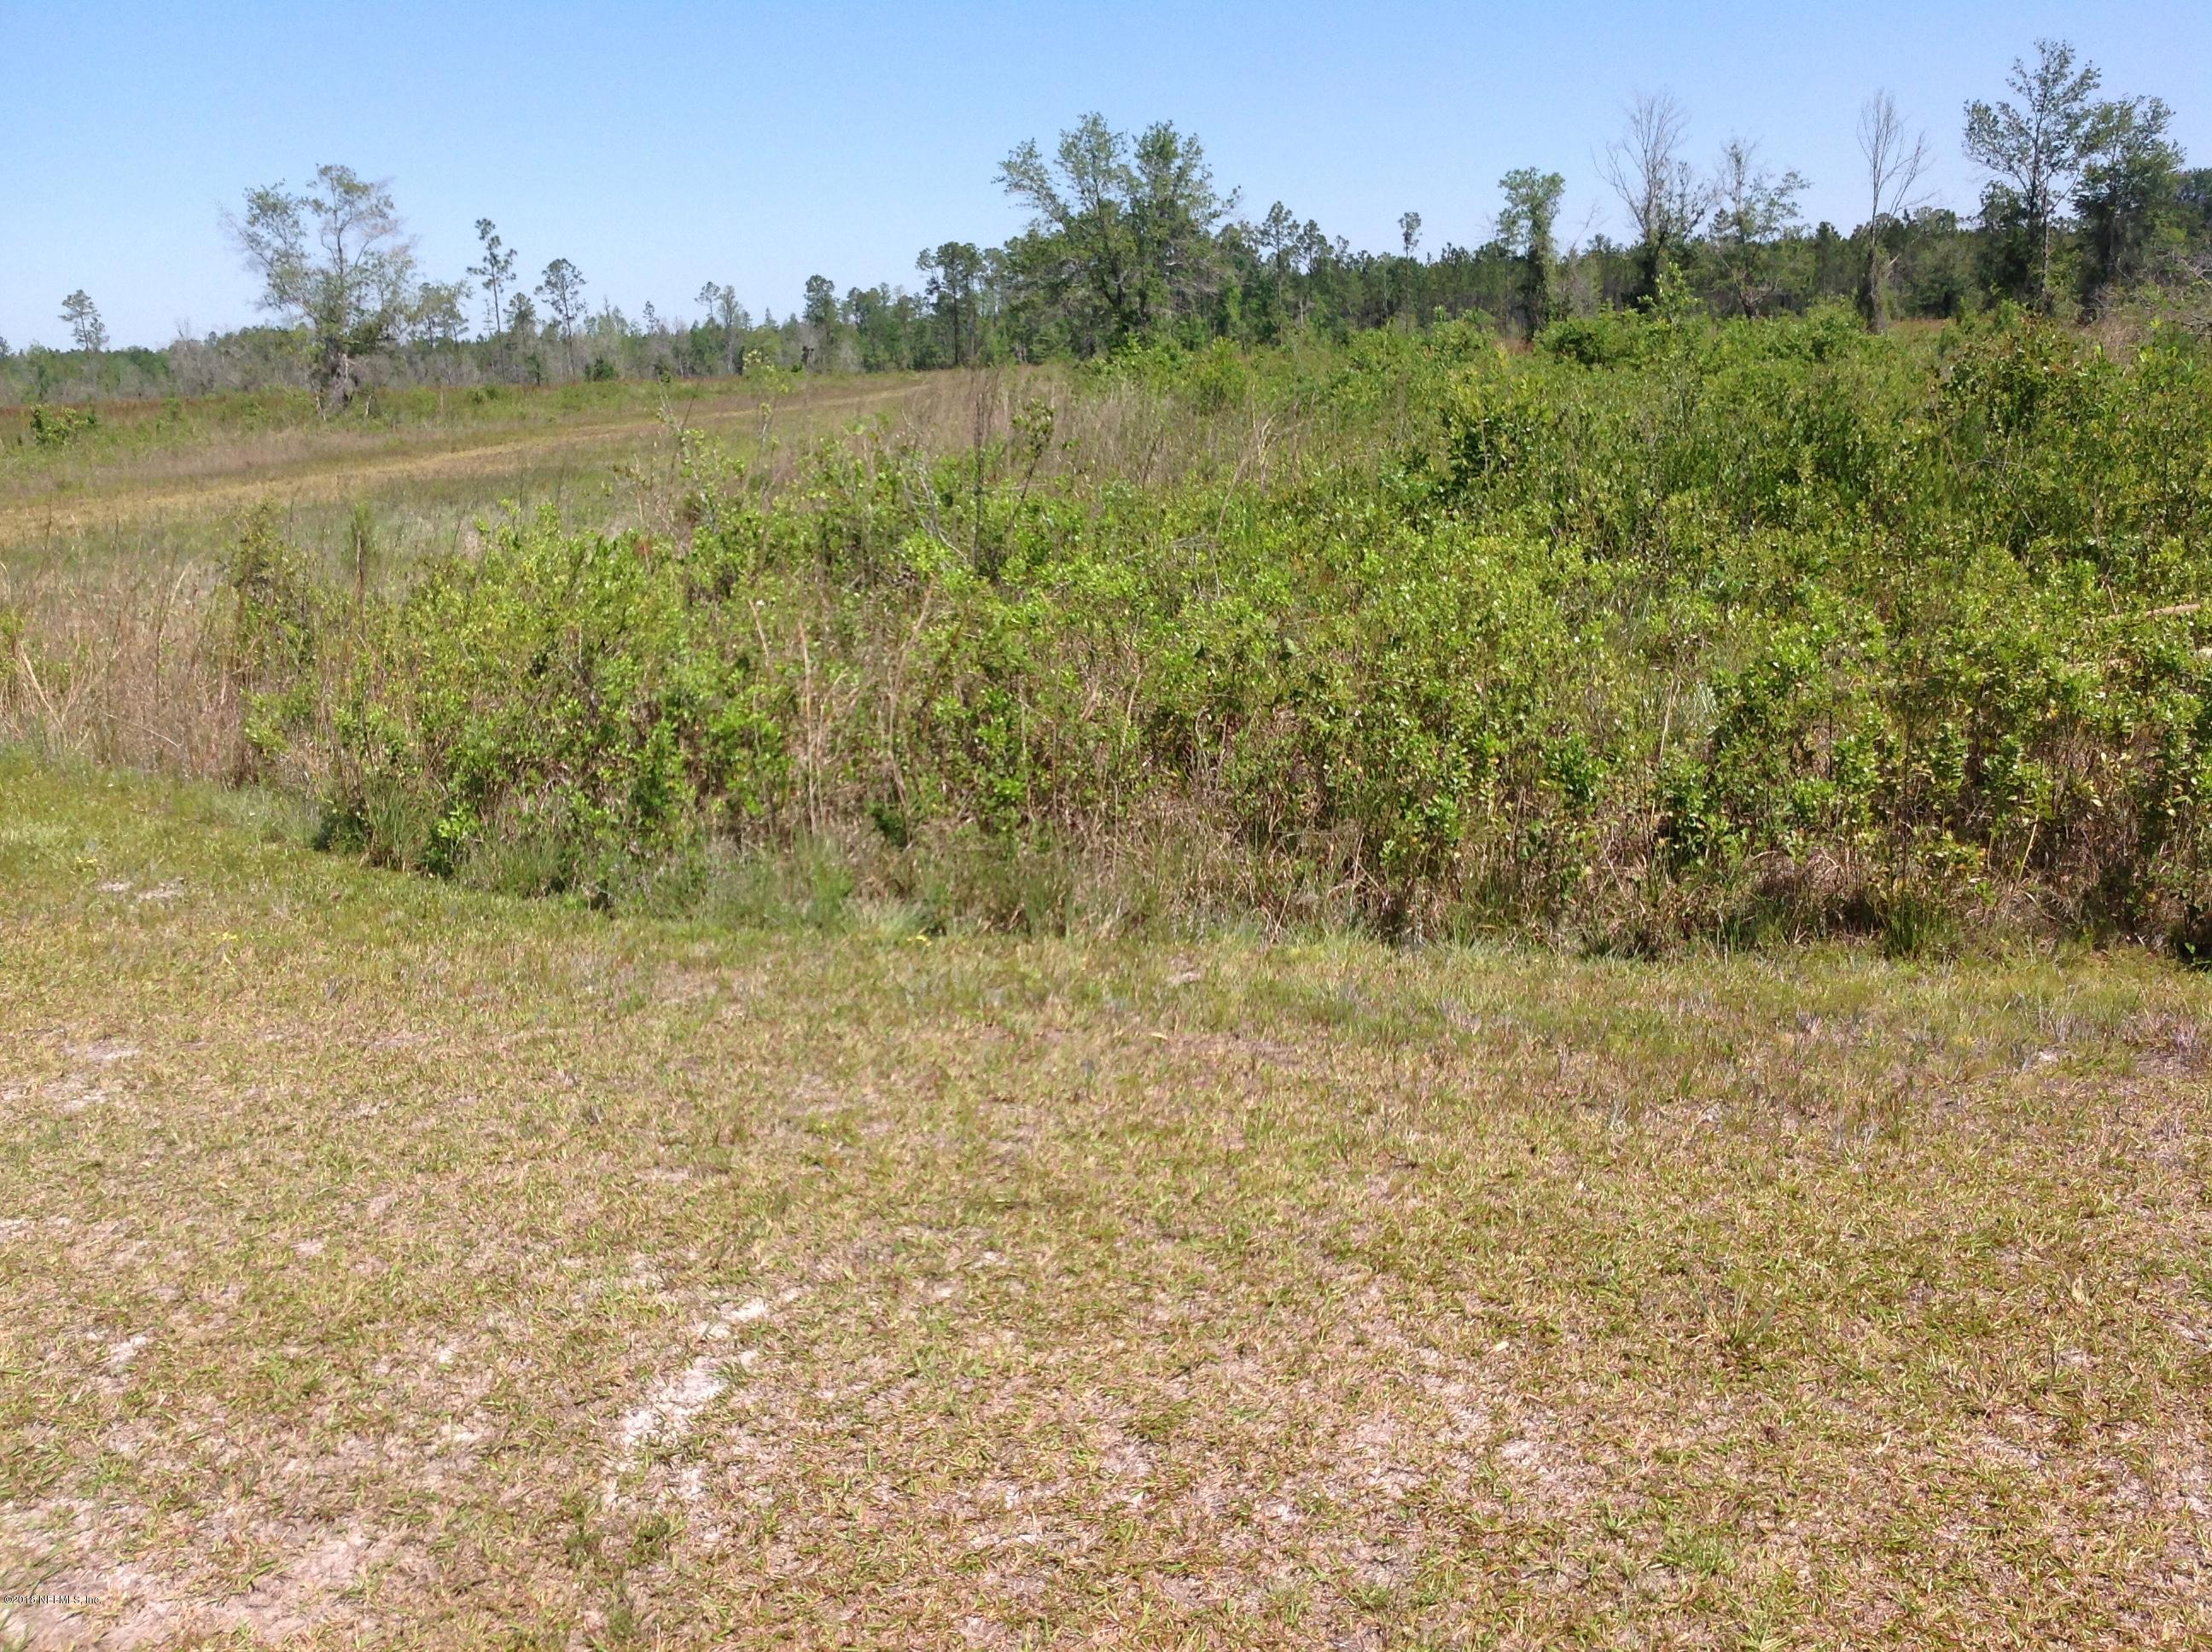 0 CHEYENNE, GLEN ST. MARY, FLORIDA 32040, ,Vacant land,For sale,CHEYENNE,934319